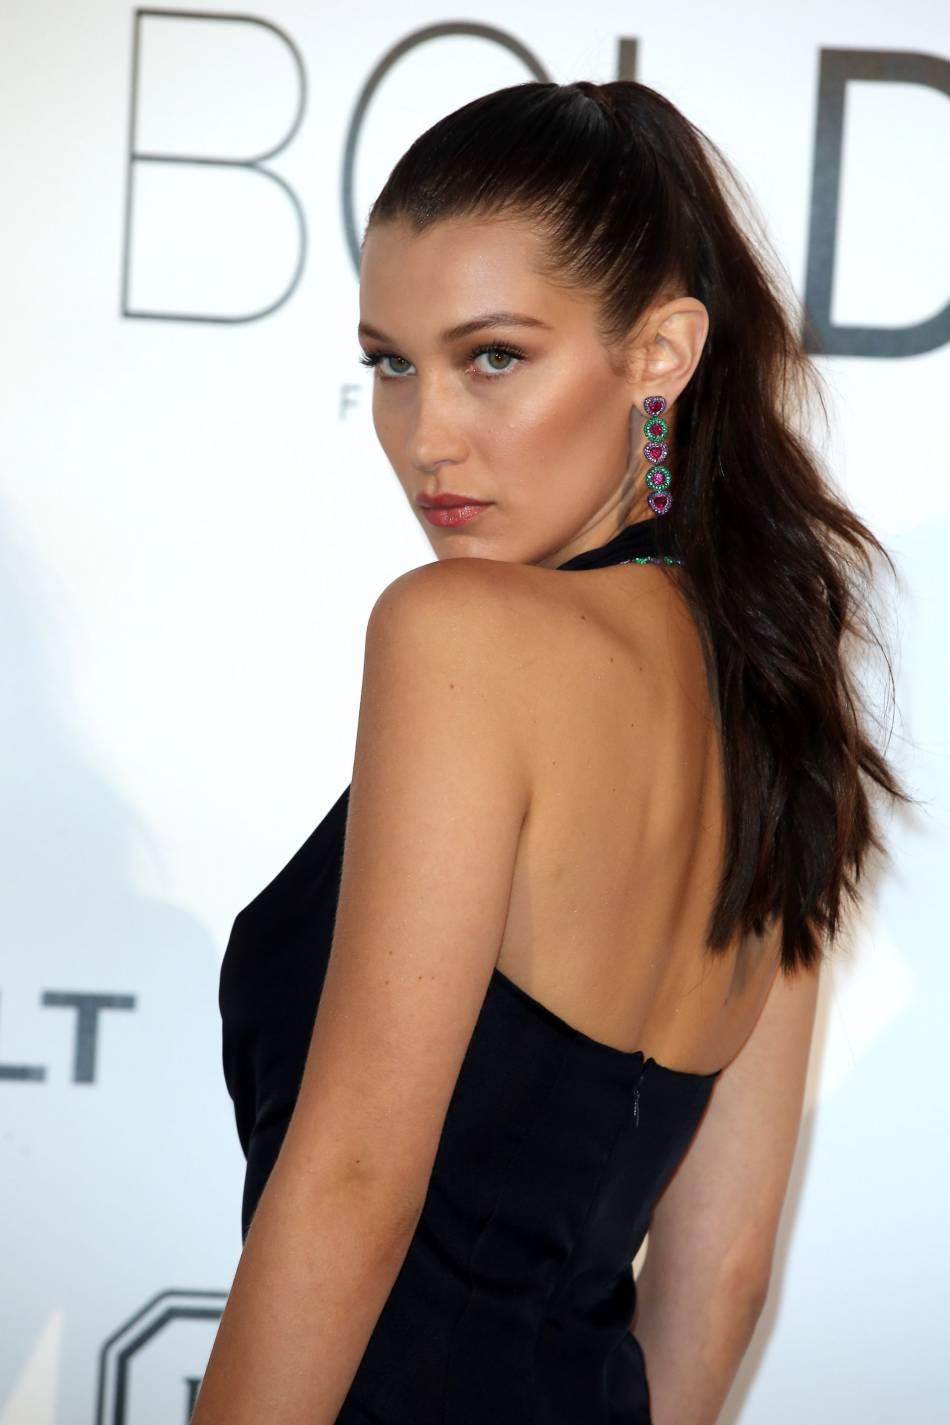 Bella Hadid au gala de l'amfAR Cinema against AIDS le 19 mai 2016 à Cannes.